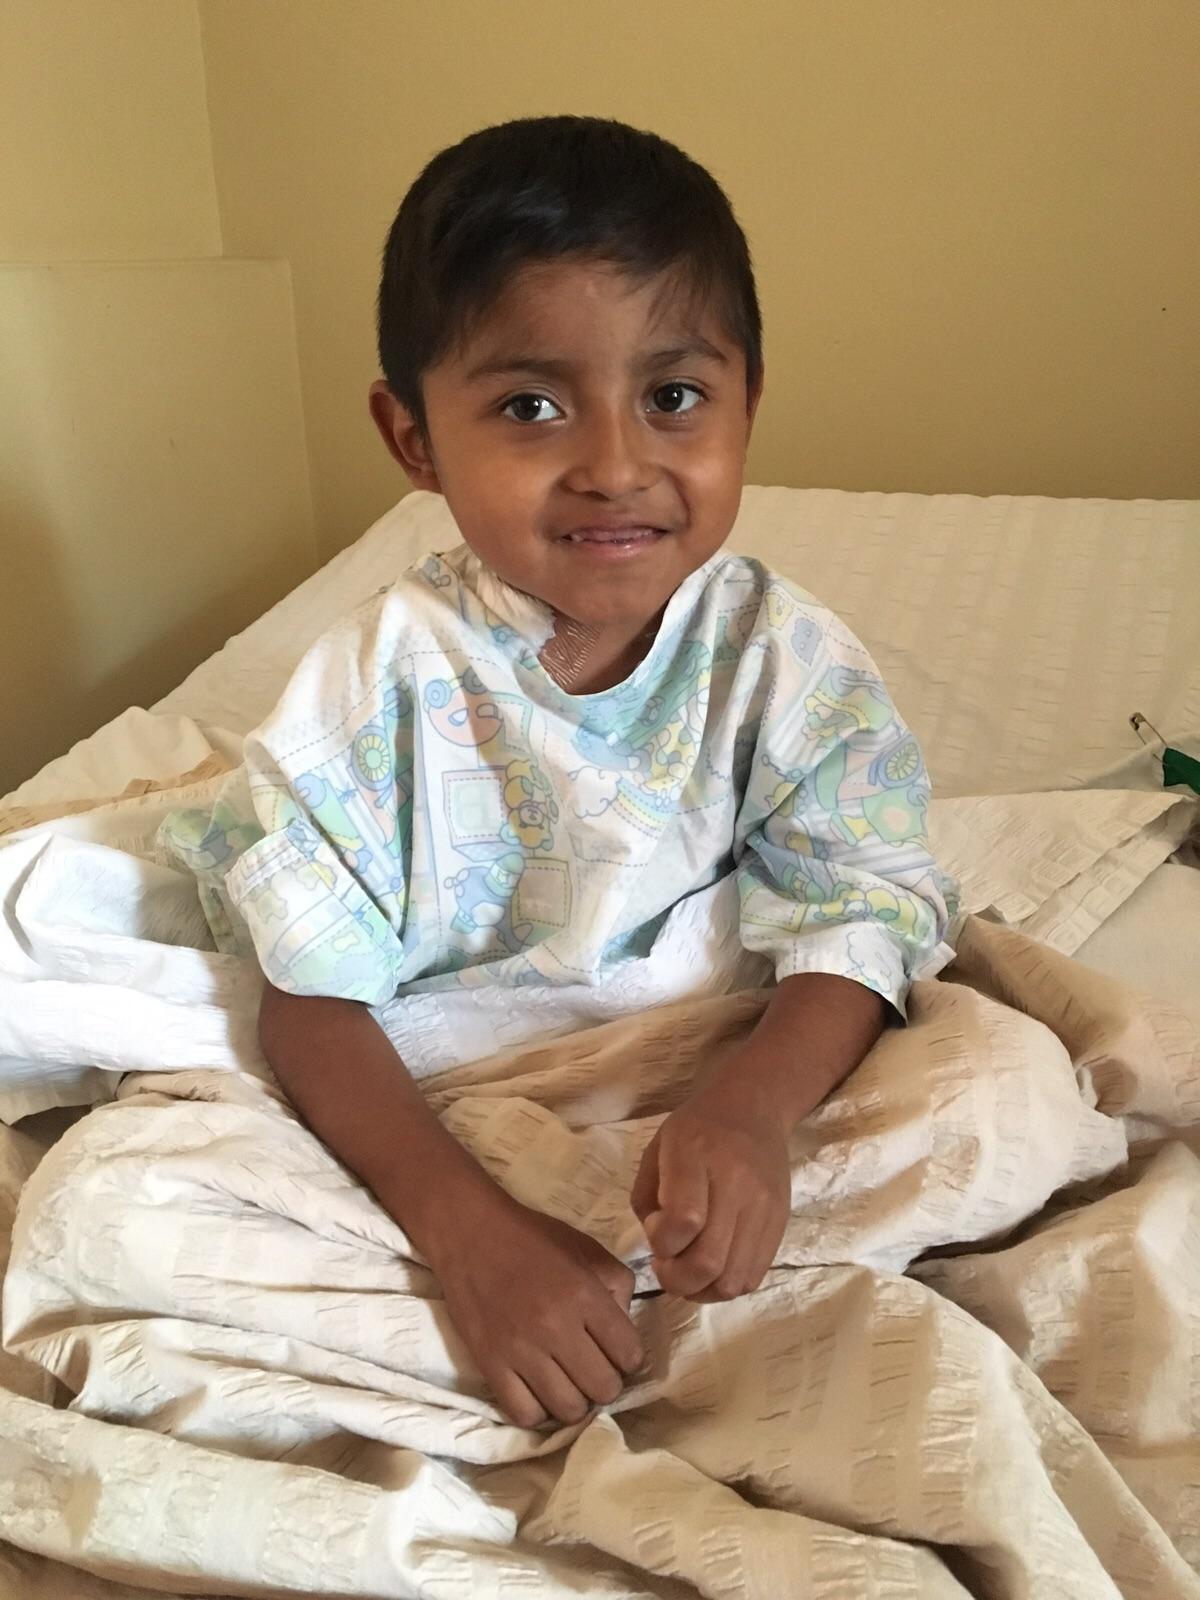 Keiser prior to surgery